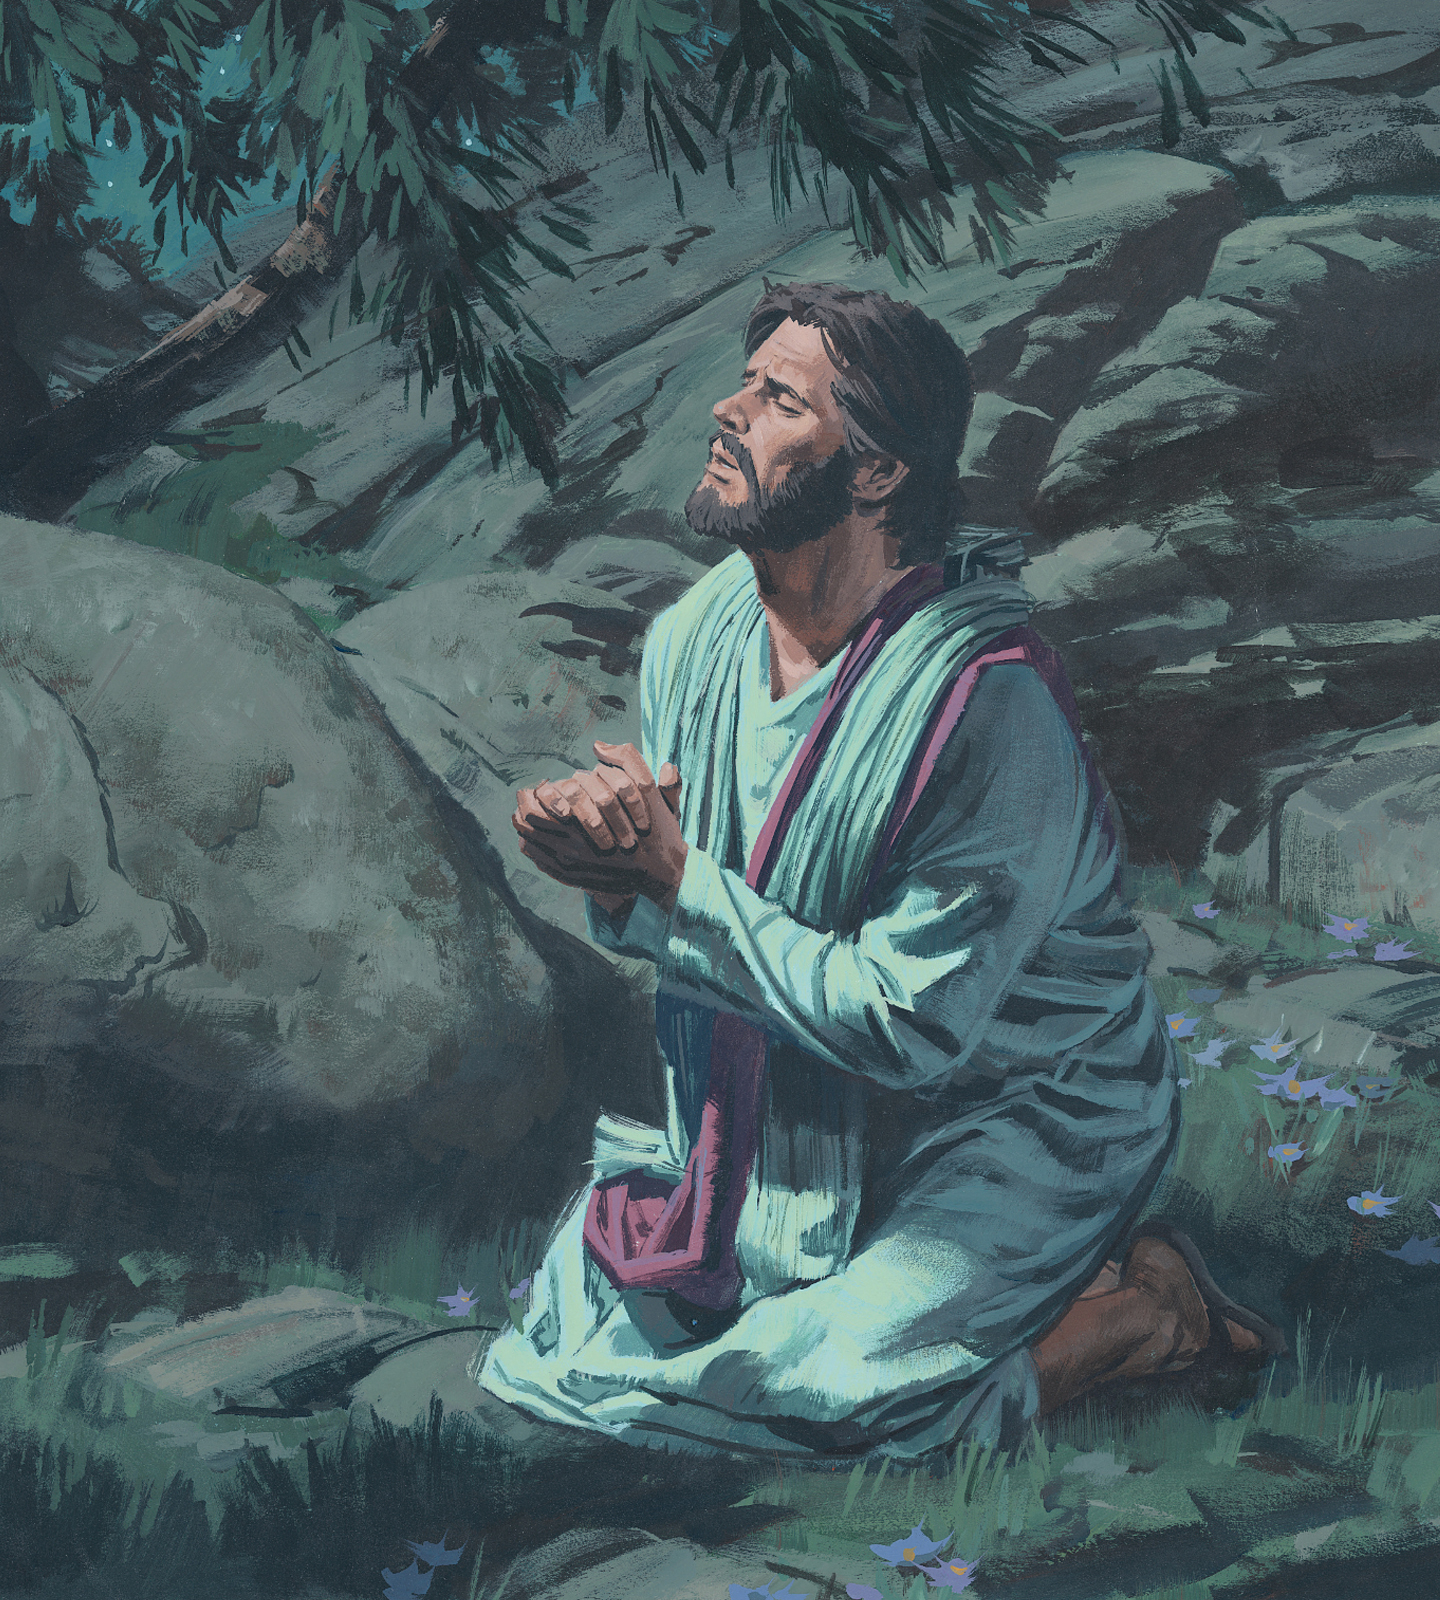 The revelation of jesus christ the garden of gethsemane - Jesus praying in the garden of gethsemane ...